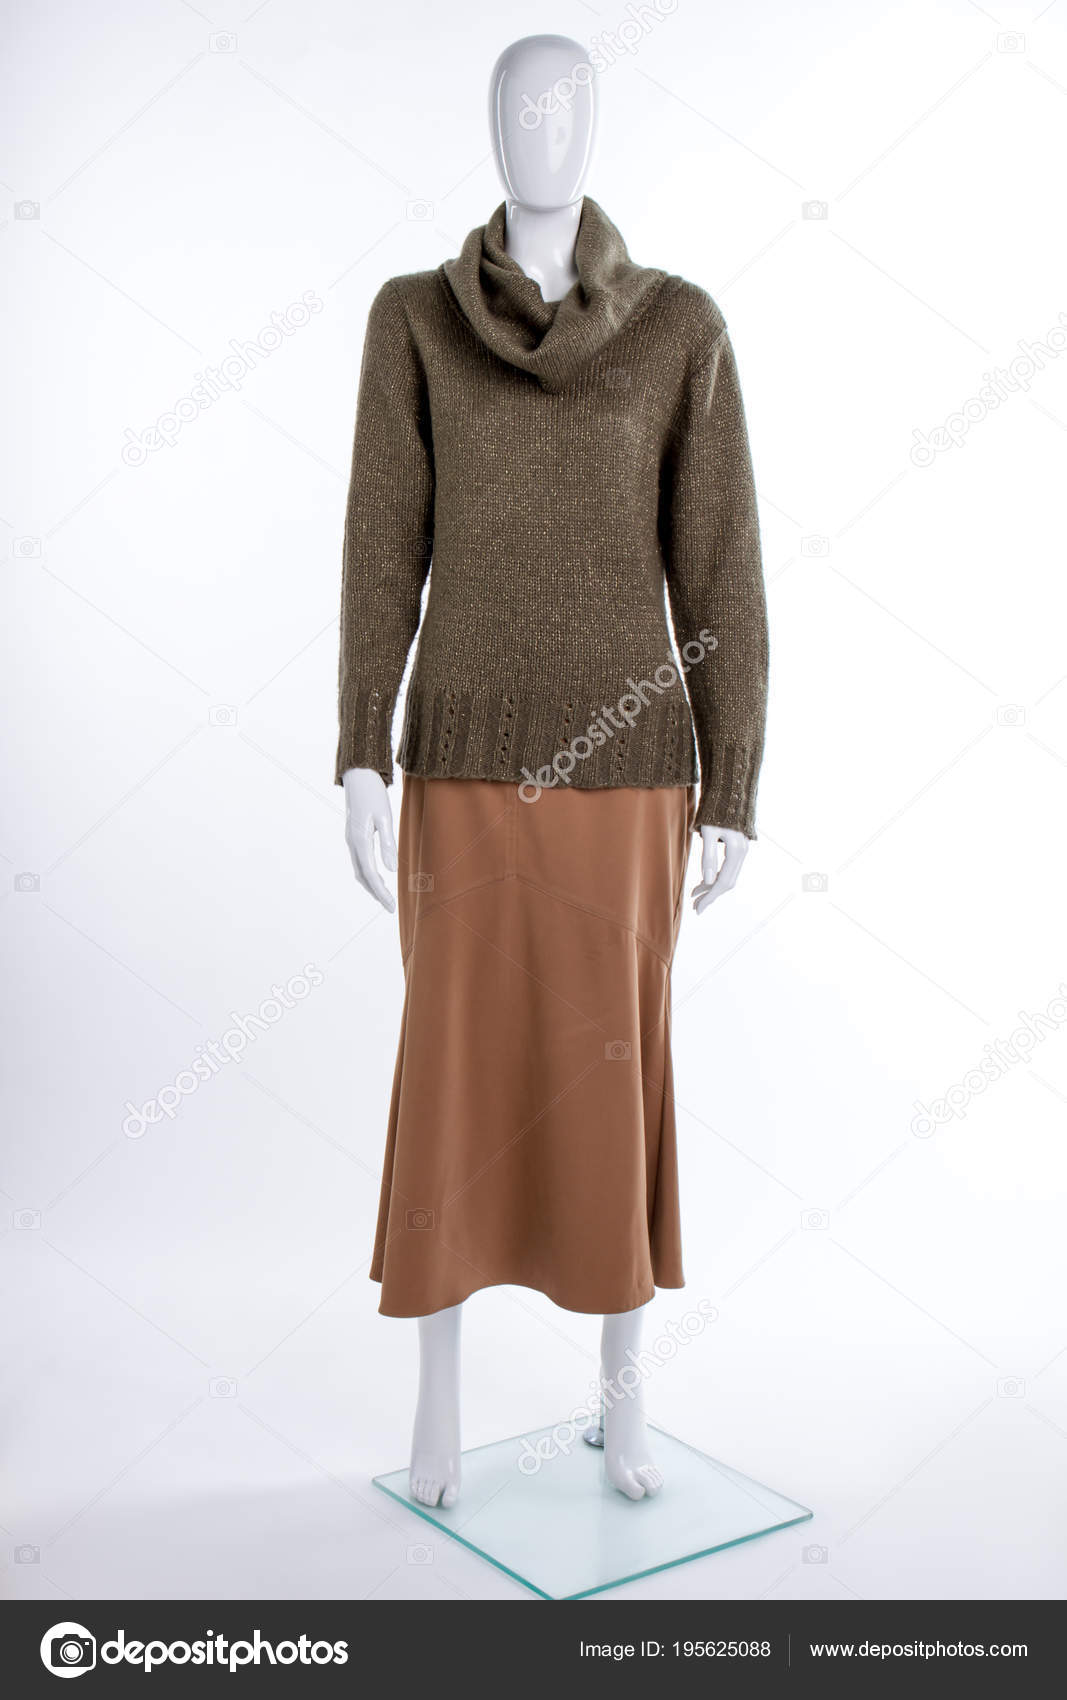 b599ca3bad31 Χακί ζιβάγκο πουλόβερ σε θηλυκά μανεκέν — Φωτογραφία Αρχείου ...